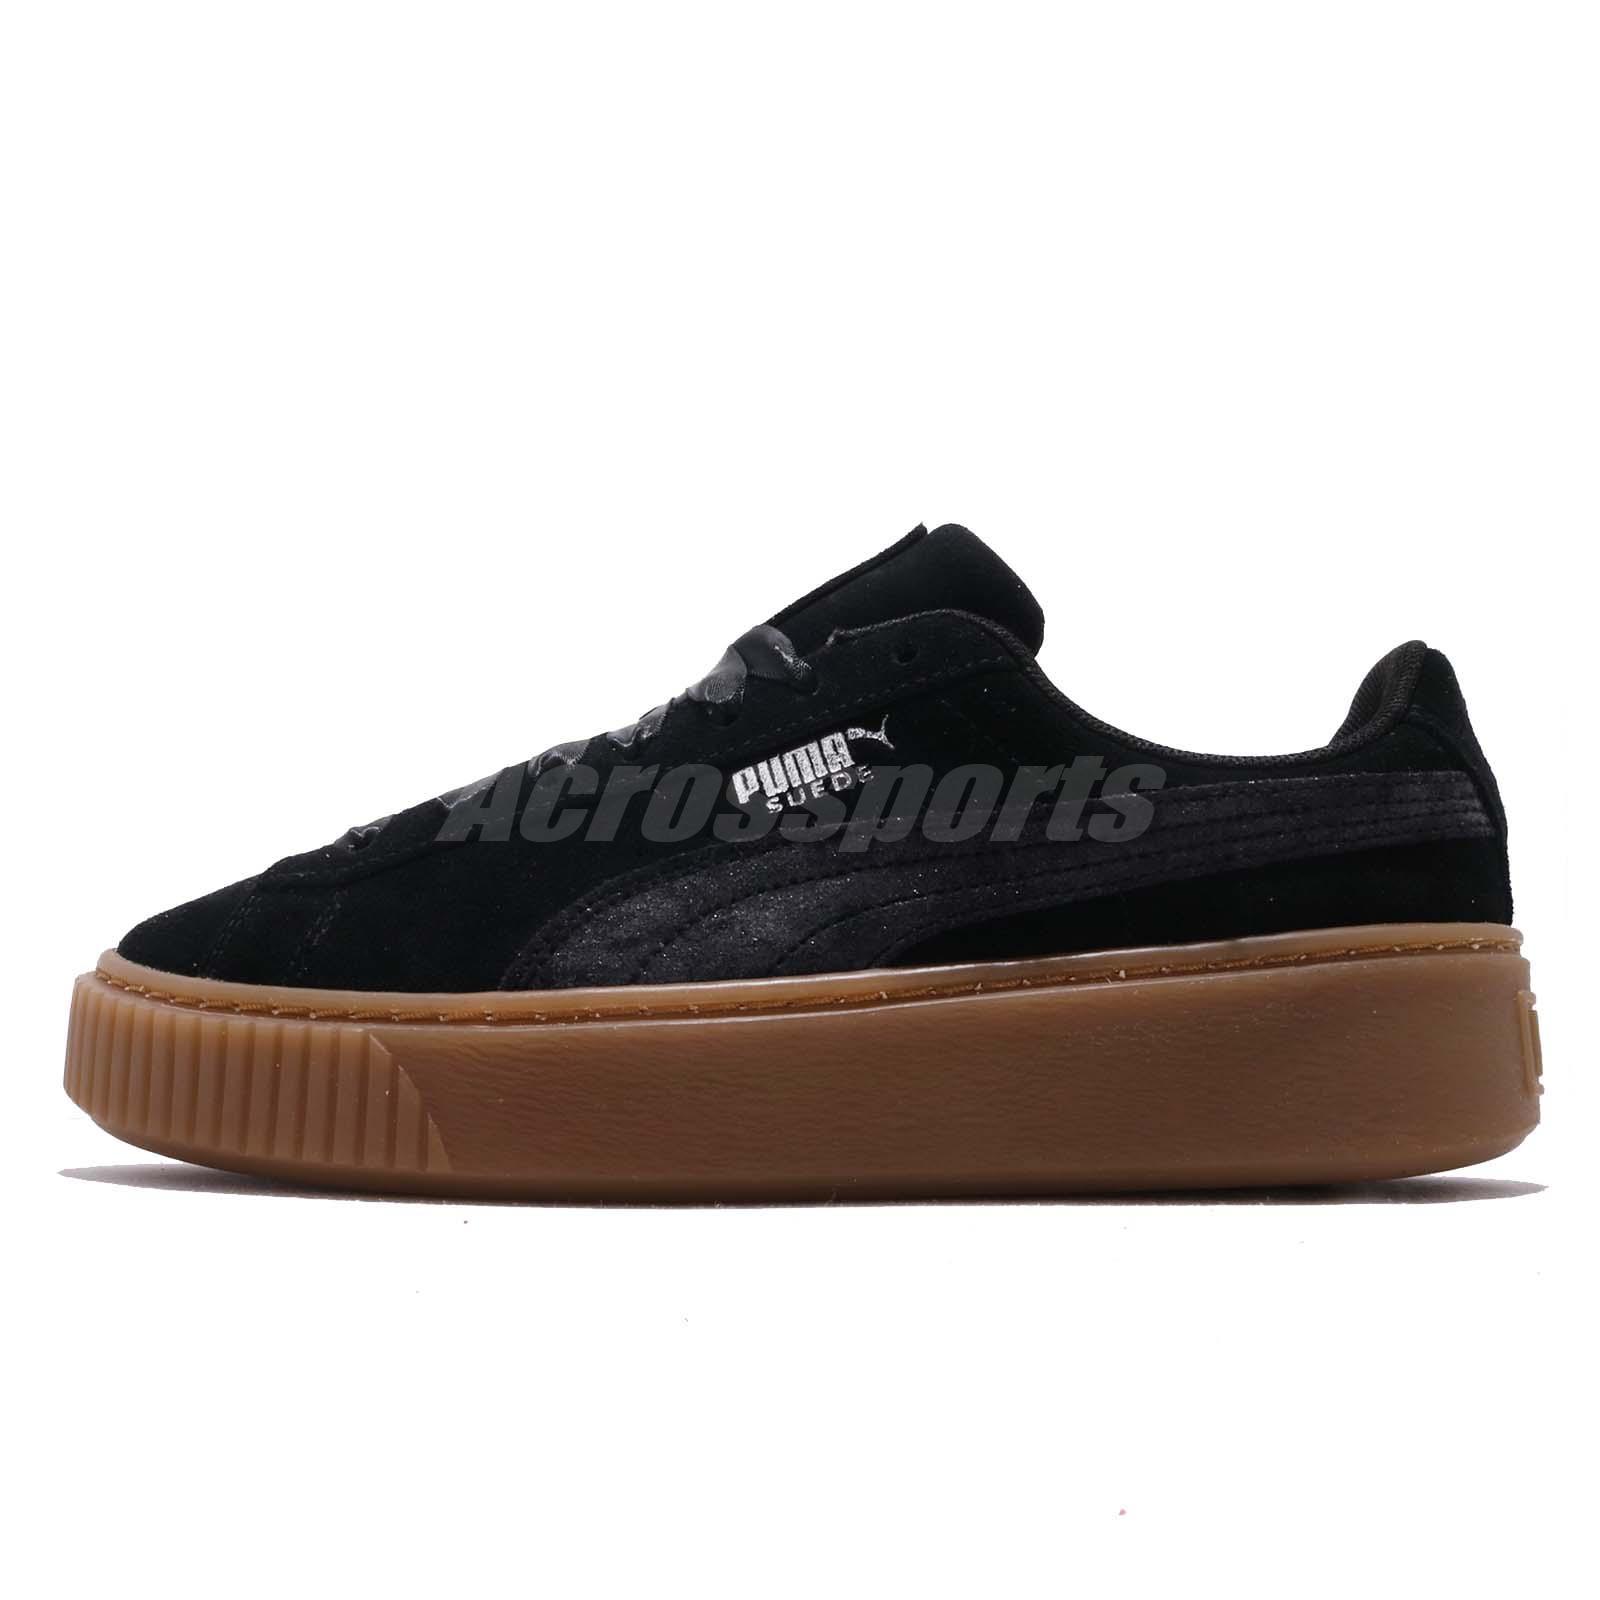 2bbd62f183e2 Puma Platform Galaxy Wns Black Gum Silver Women Casual Shoes Sneakers  369172-03